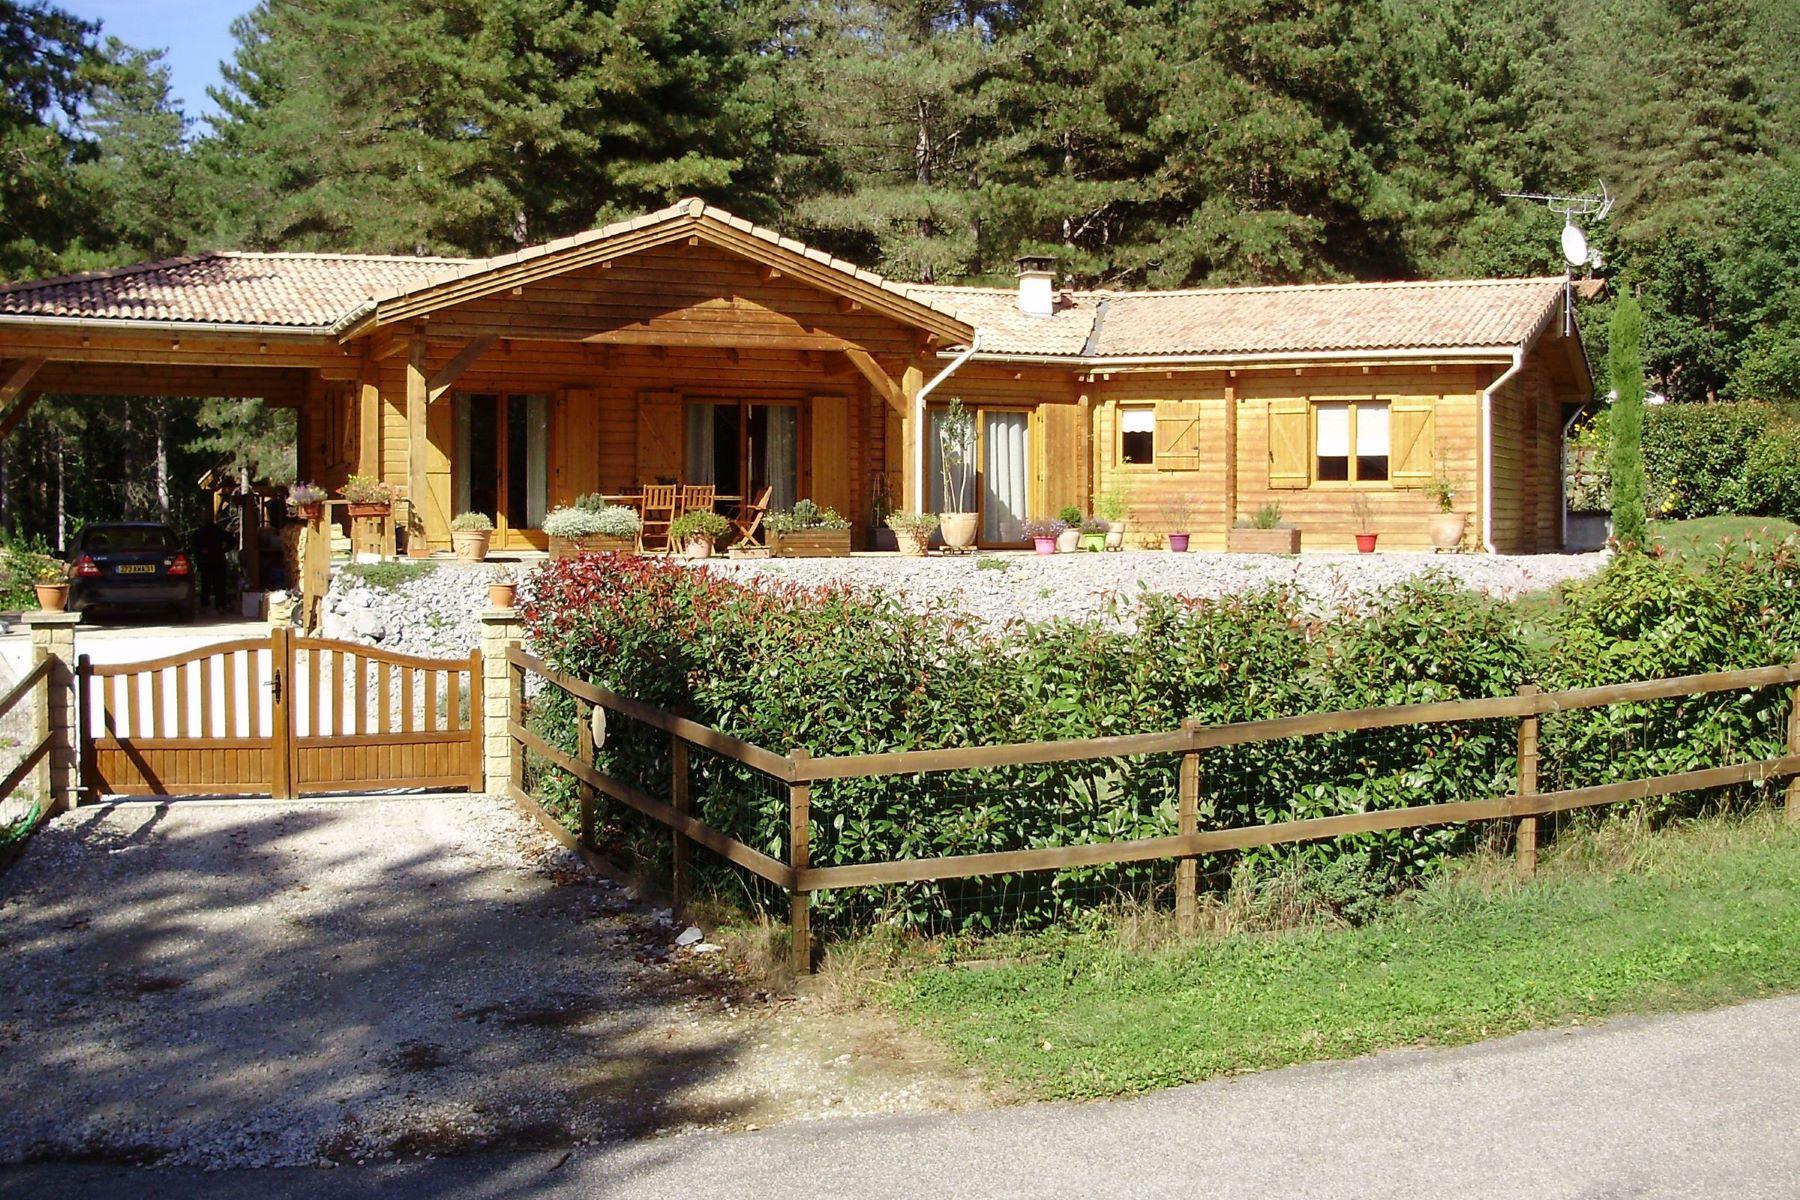 Частный односемейный дом для того Продажа на beautiful 135 m² wood-house 30 minutes to Bagnère de Luchon Other Midi Pyrenees, Midi Pyrenees, 31510 Франция